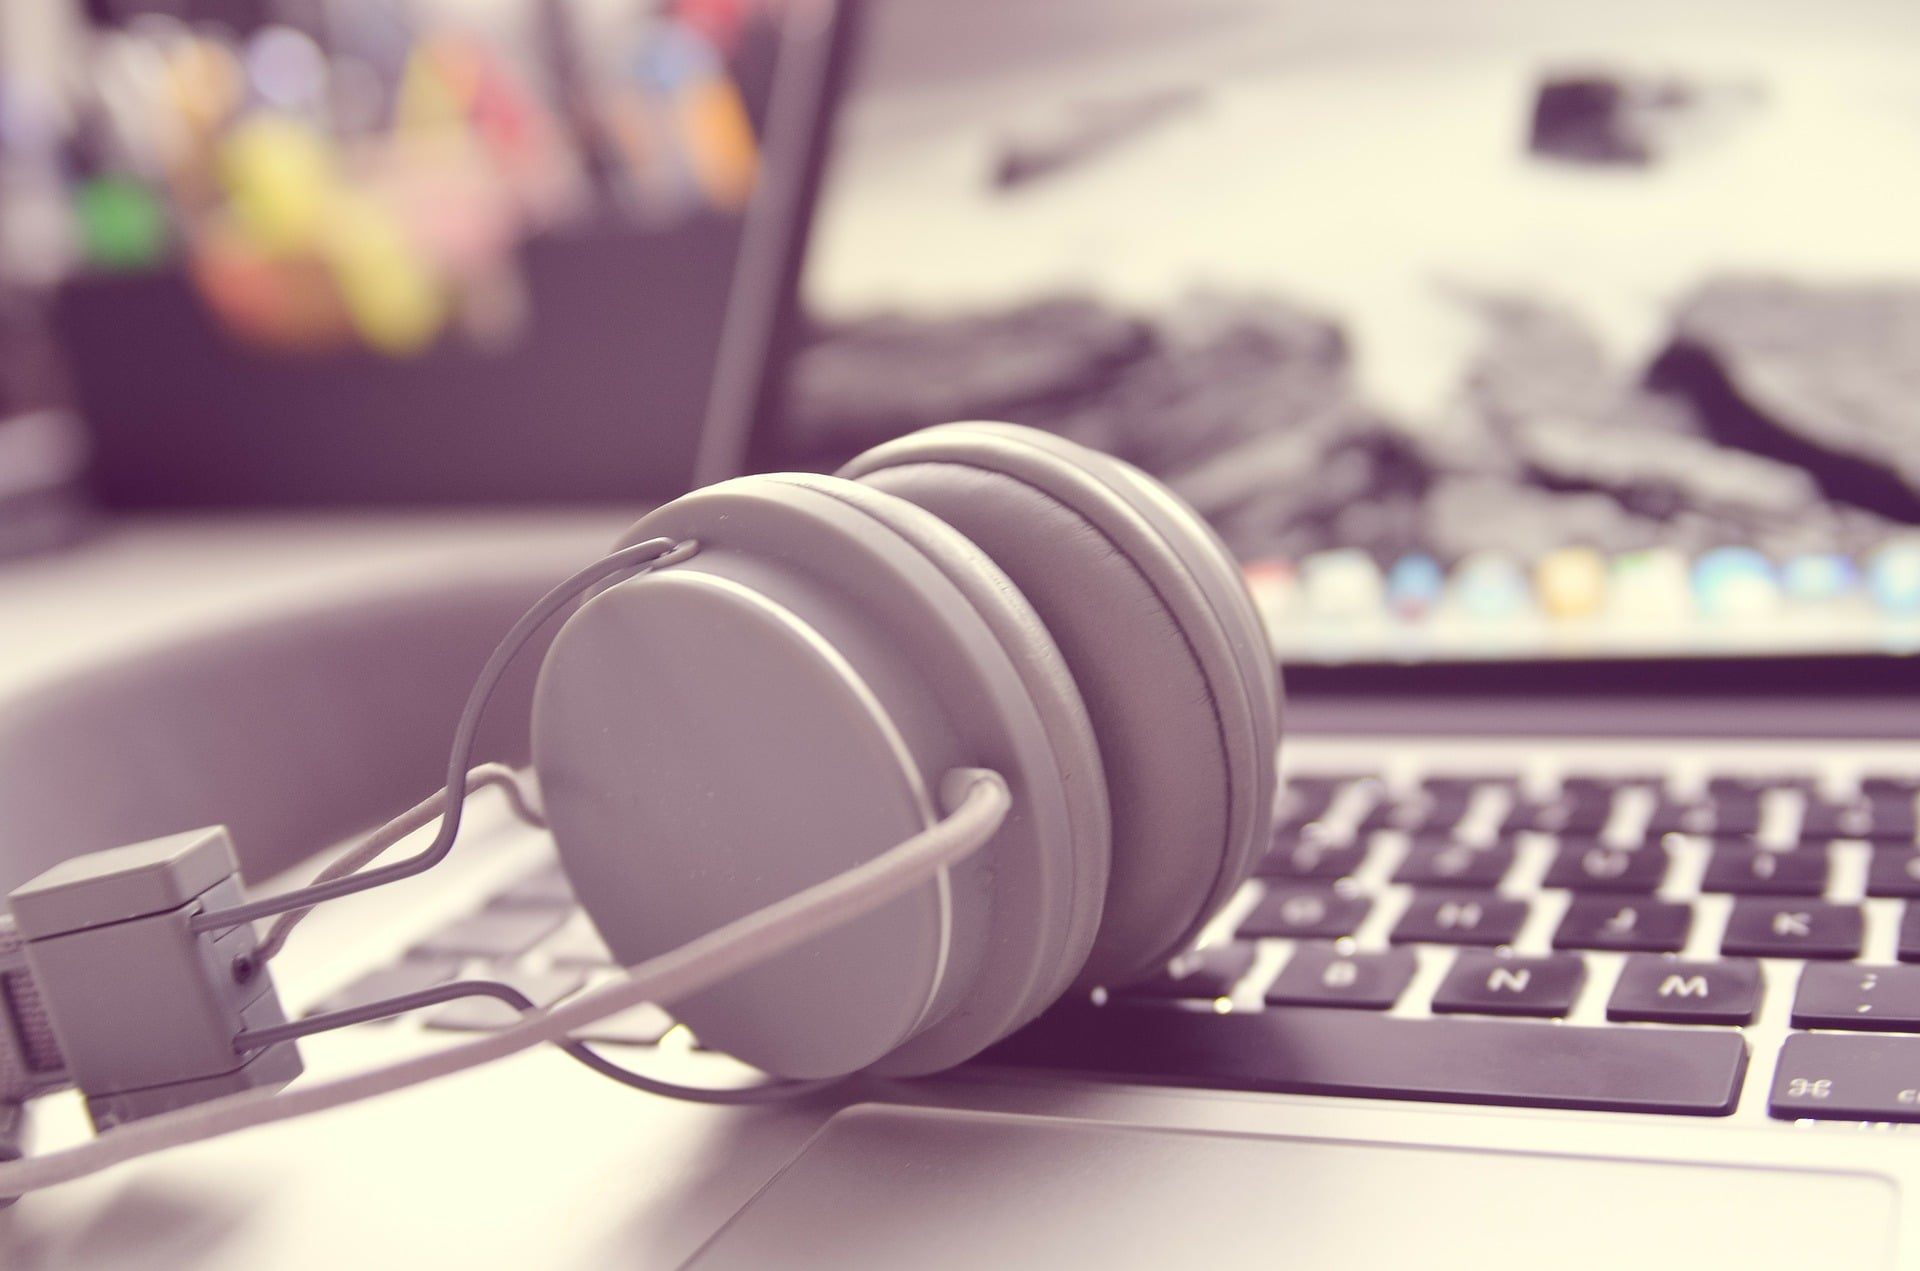 Headphones rest on a laptop